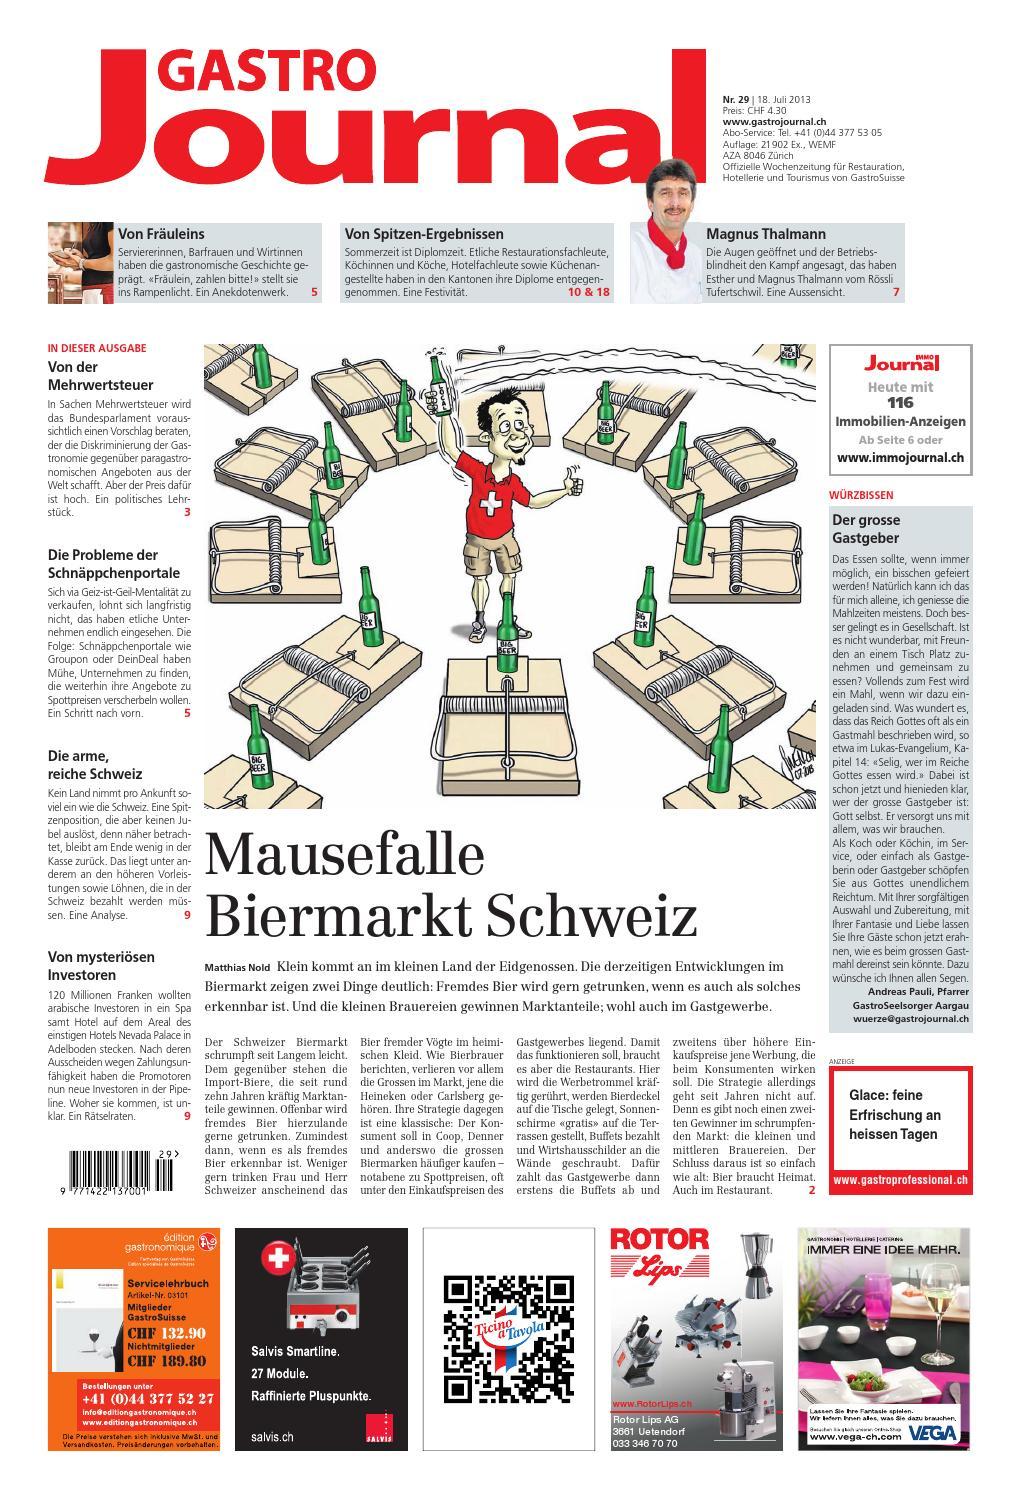 GastroJournal 29/2013 by Gastrojournal - issuu